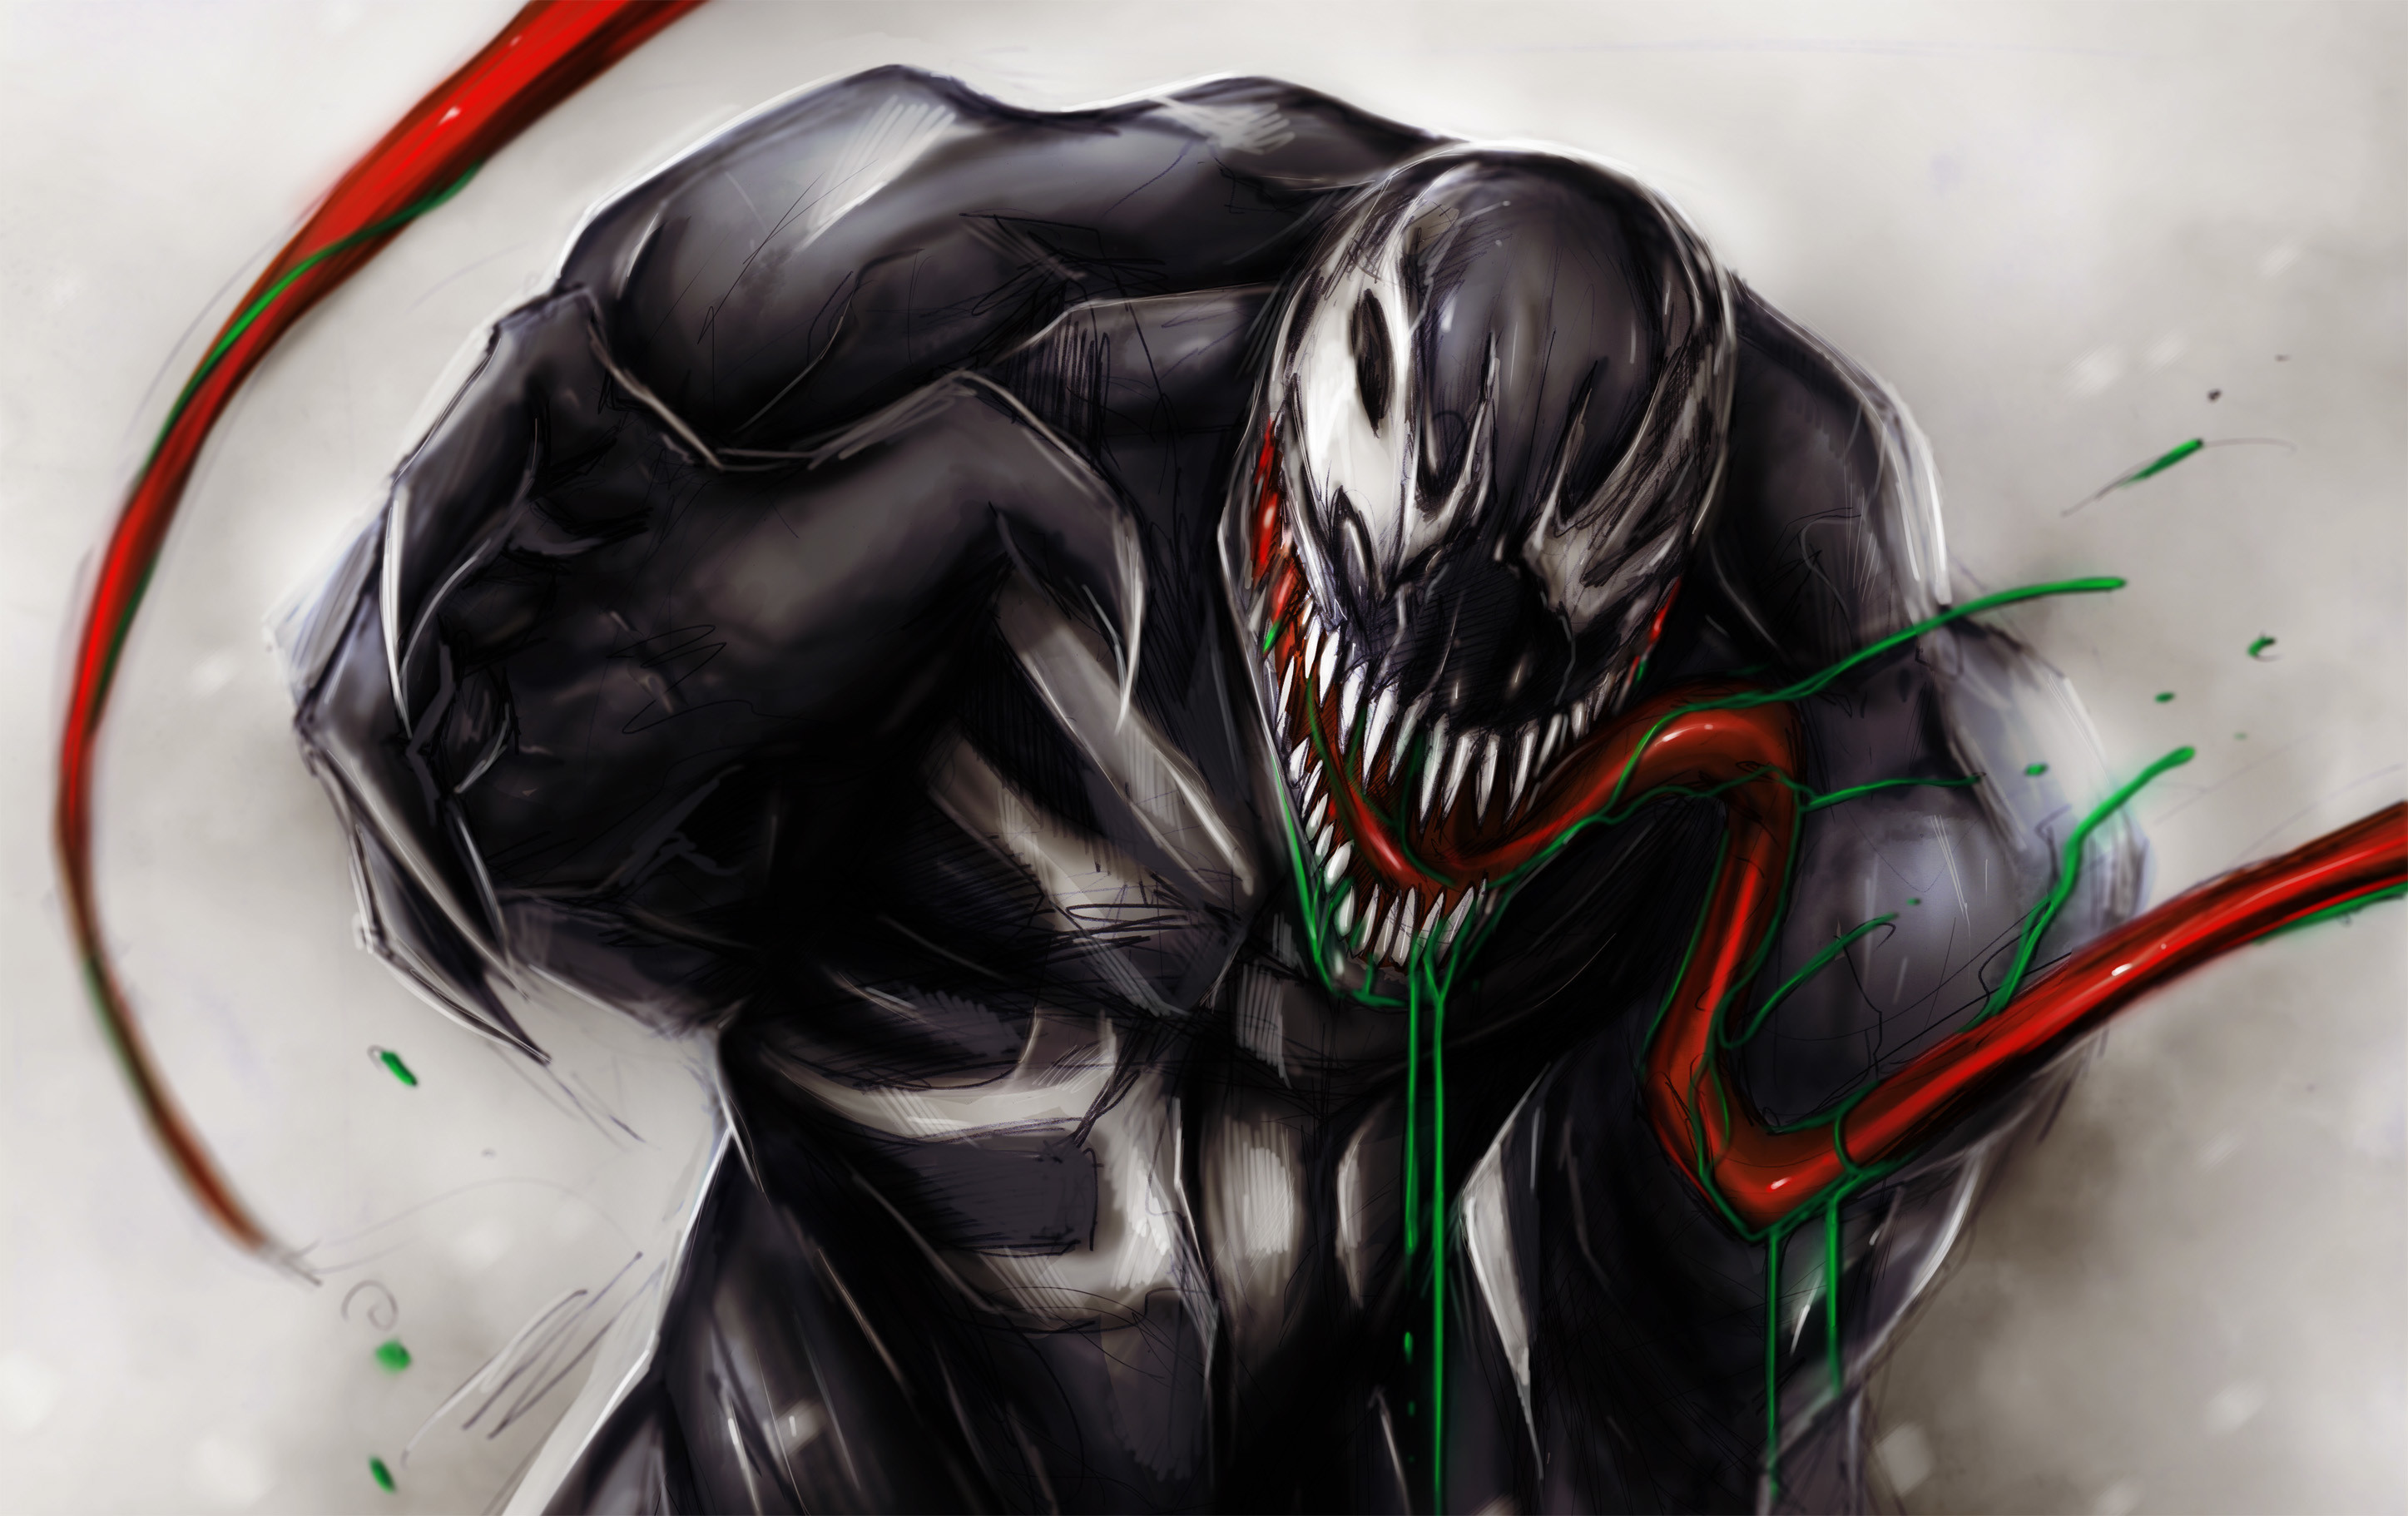 Filename: cletus-kasady-venom-simbiot.jpg